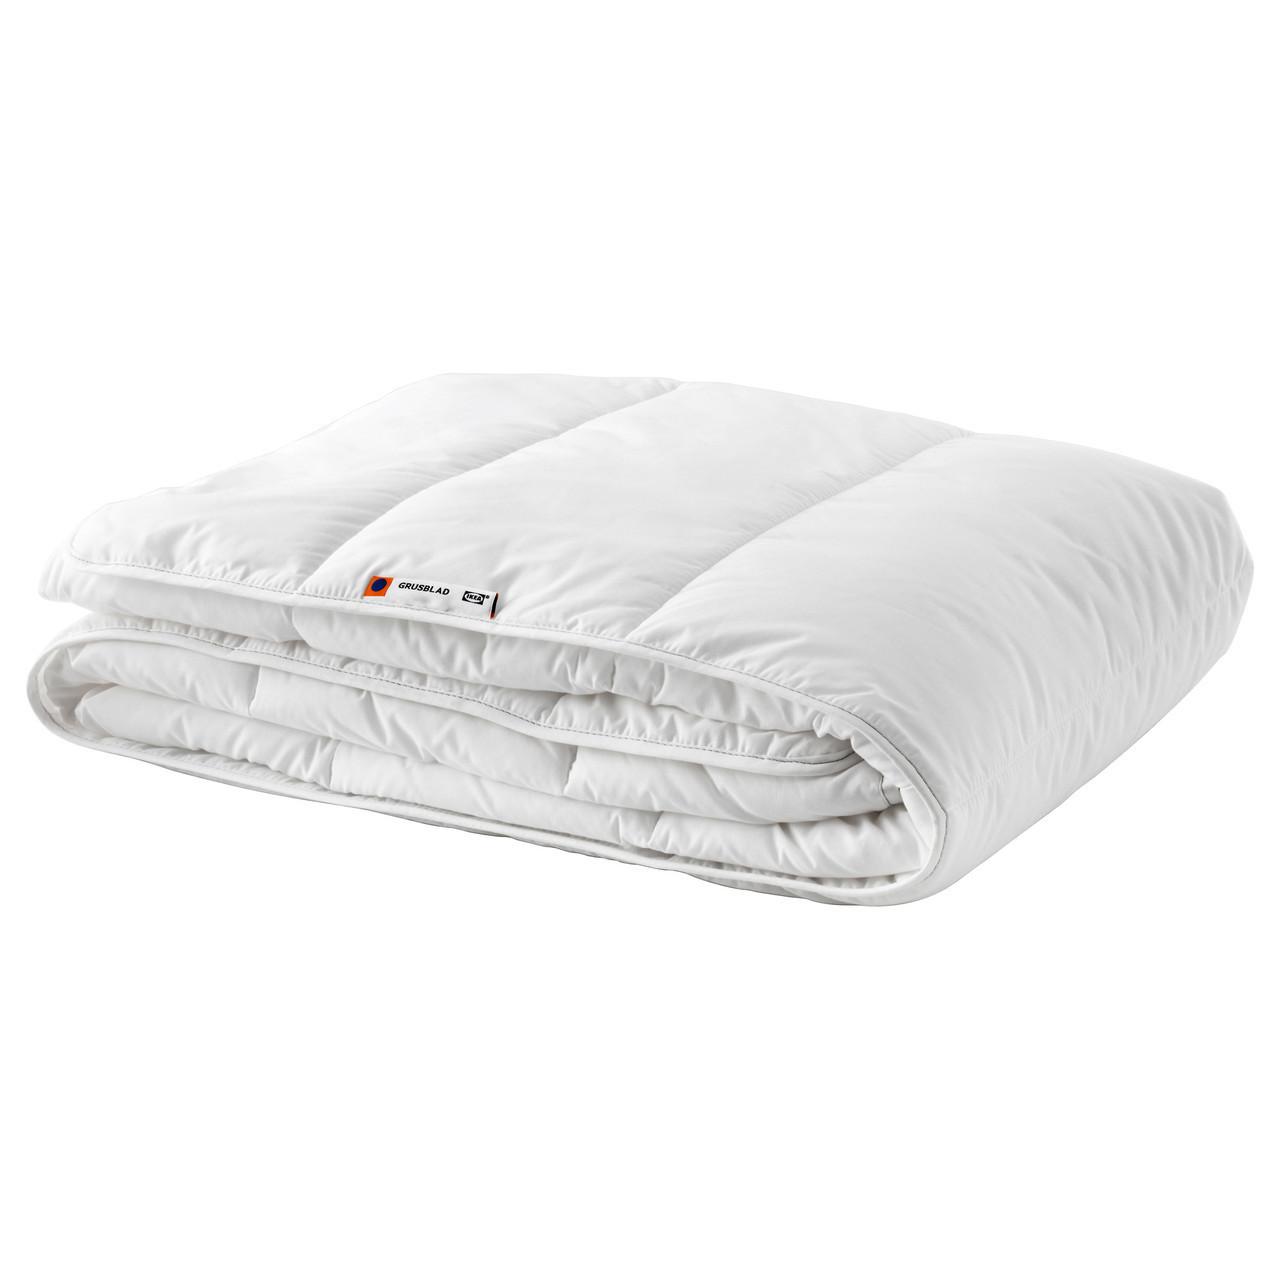 ГРУСБЛАД Одеяло, прохладное, 150*200см, 60271705, ИКЕА,  IKEA, GRUSBLAD - ИКЕА-МИР в Тернополе